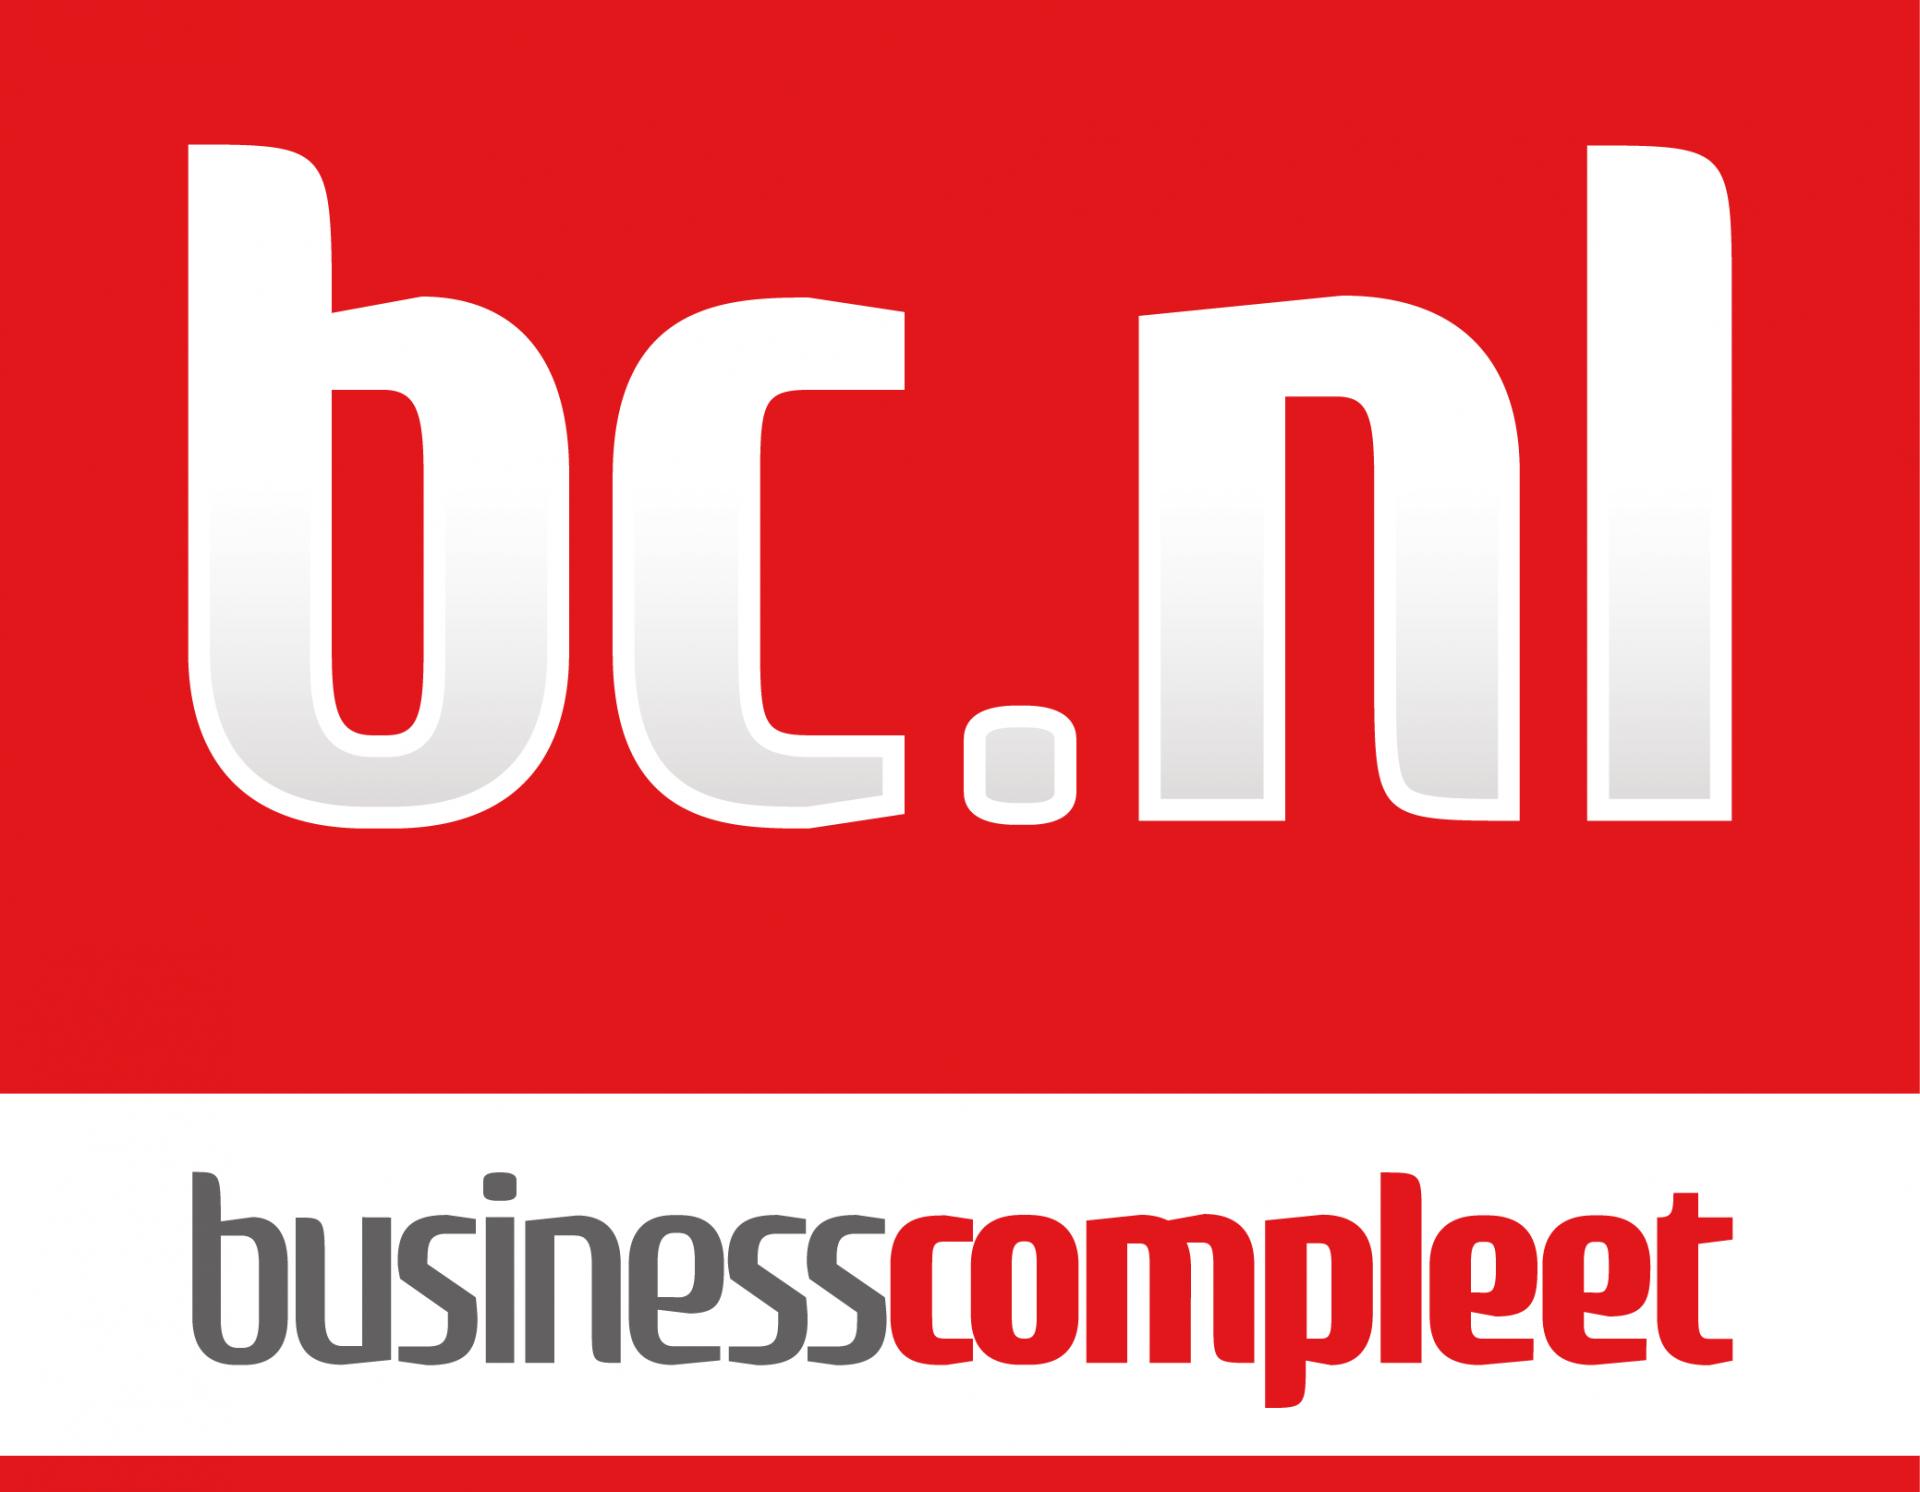 muis software neemt business compleet over